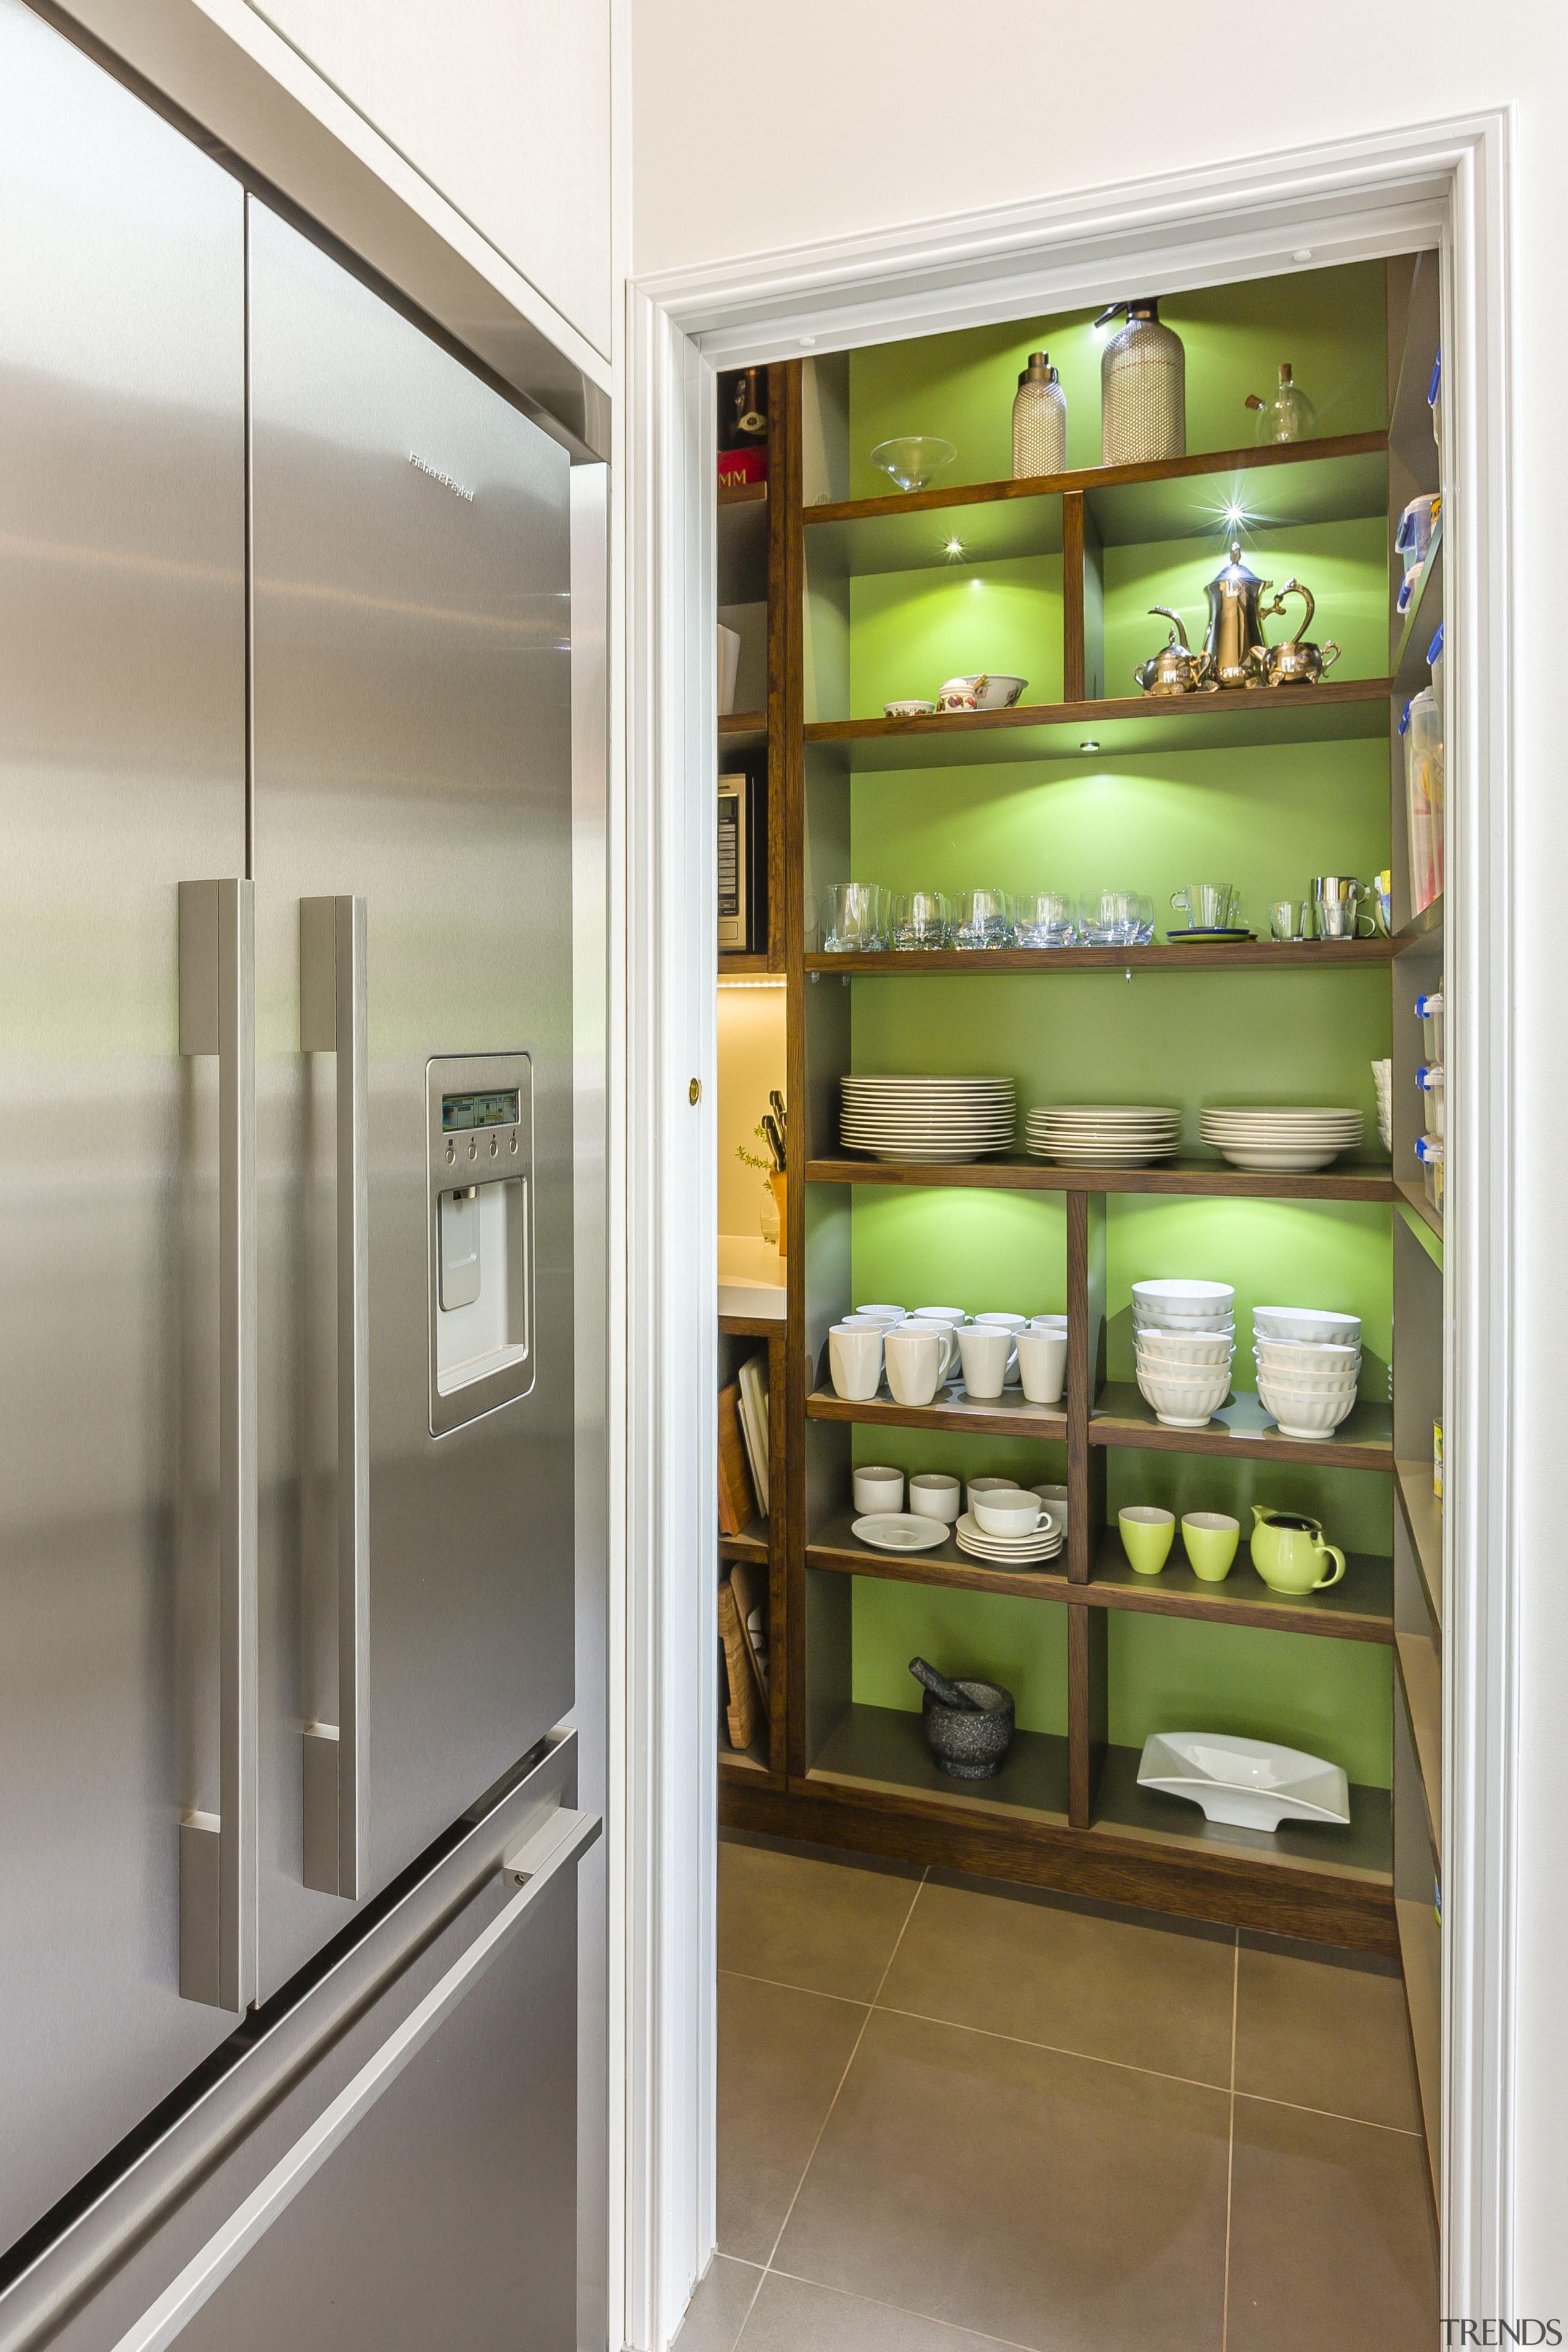 Crockery display and french door refrigerator - Crockery refrigerator, shelf, white